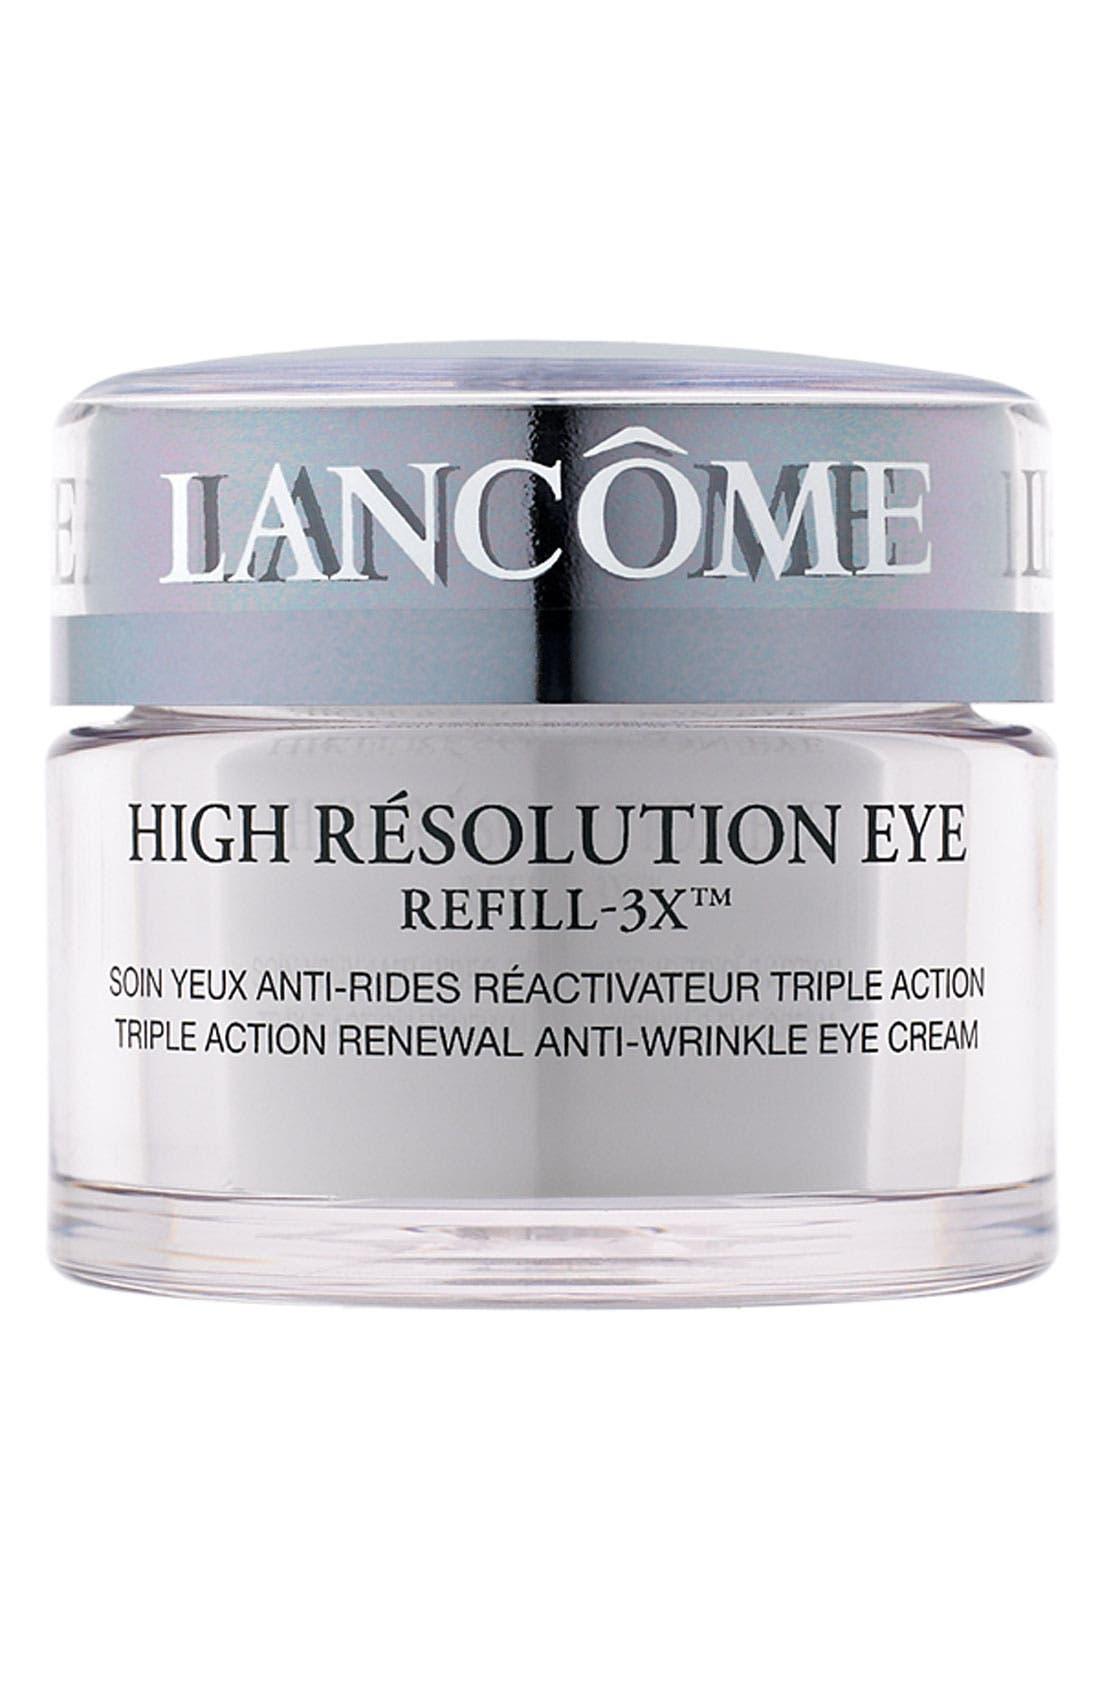 High Résolution Refill-3X Anti-Wrinkle Eye Cream,                             Main thumbnail 1, color,                             NO COLOR